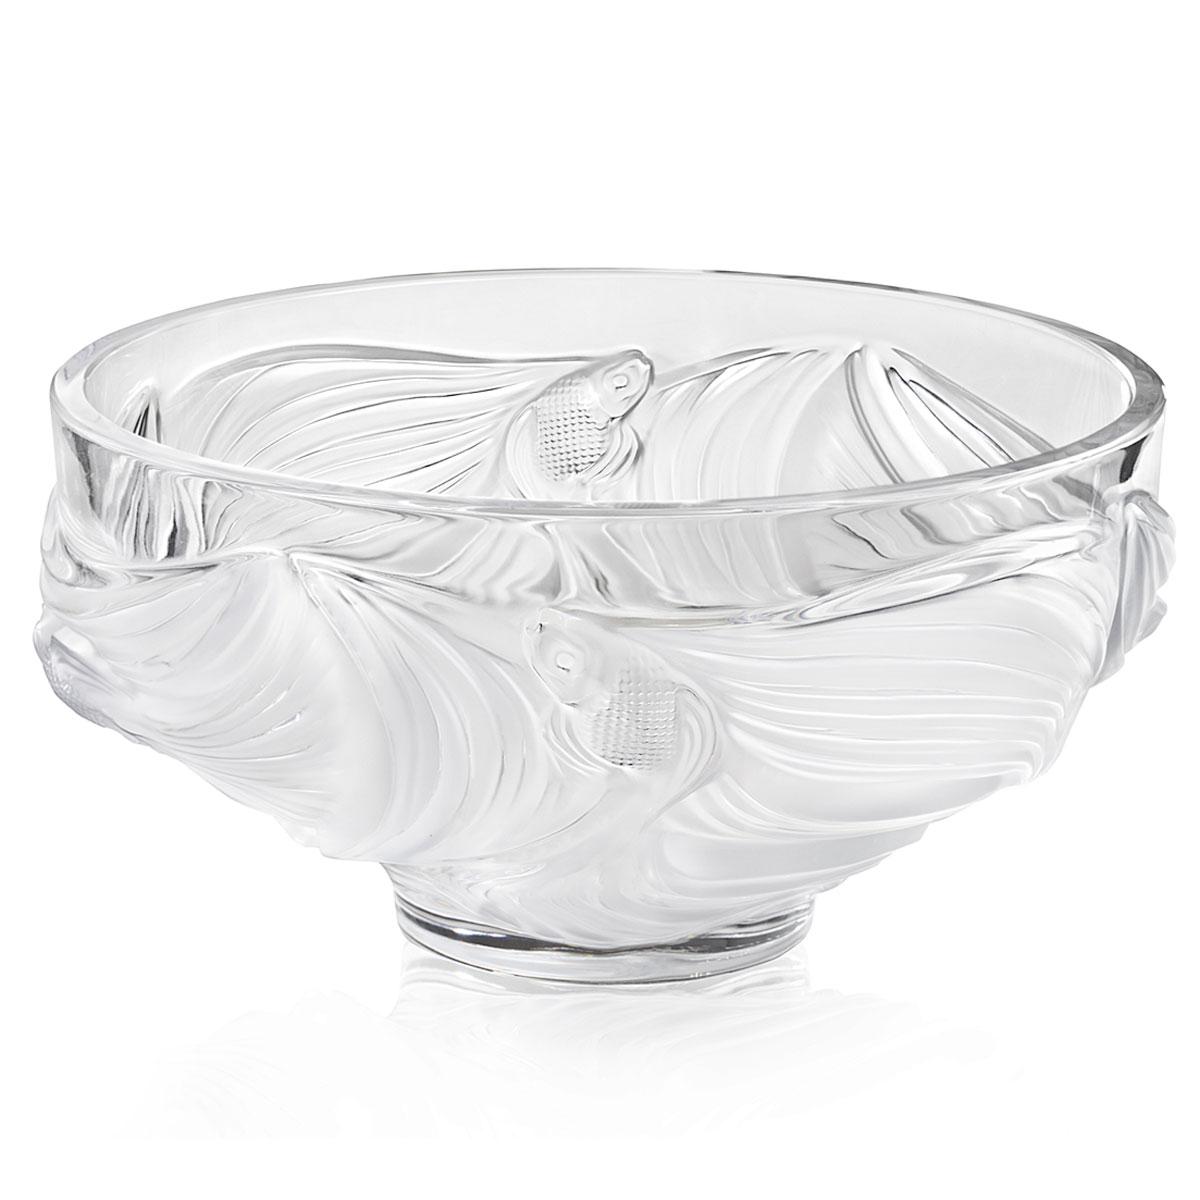 Lalique Poissons Combattants Aquatique Bowl